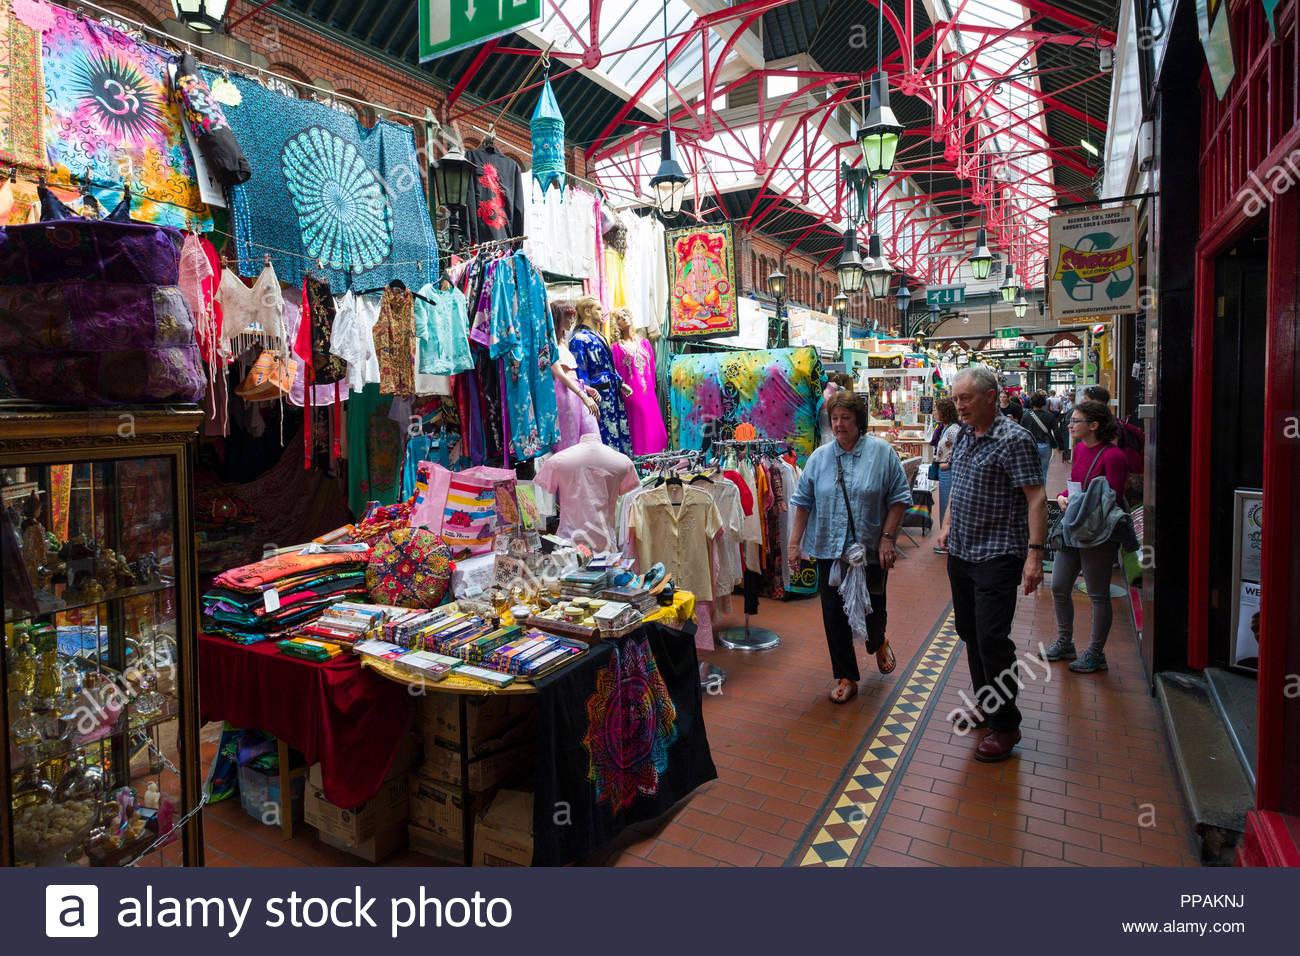 Stalls selling various items inside George's Street Arcade, Dublin, Leinster, Ireland Stock Photo